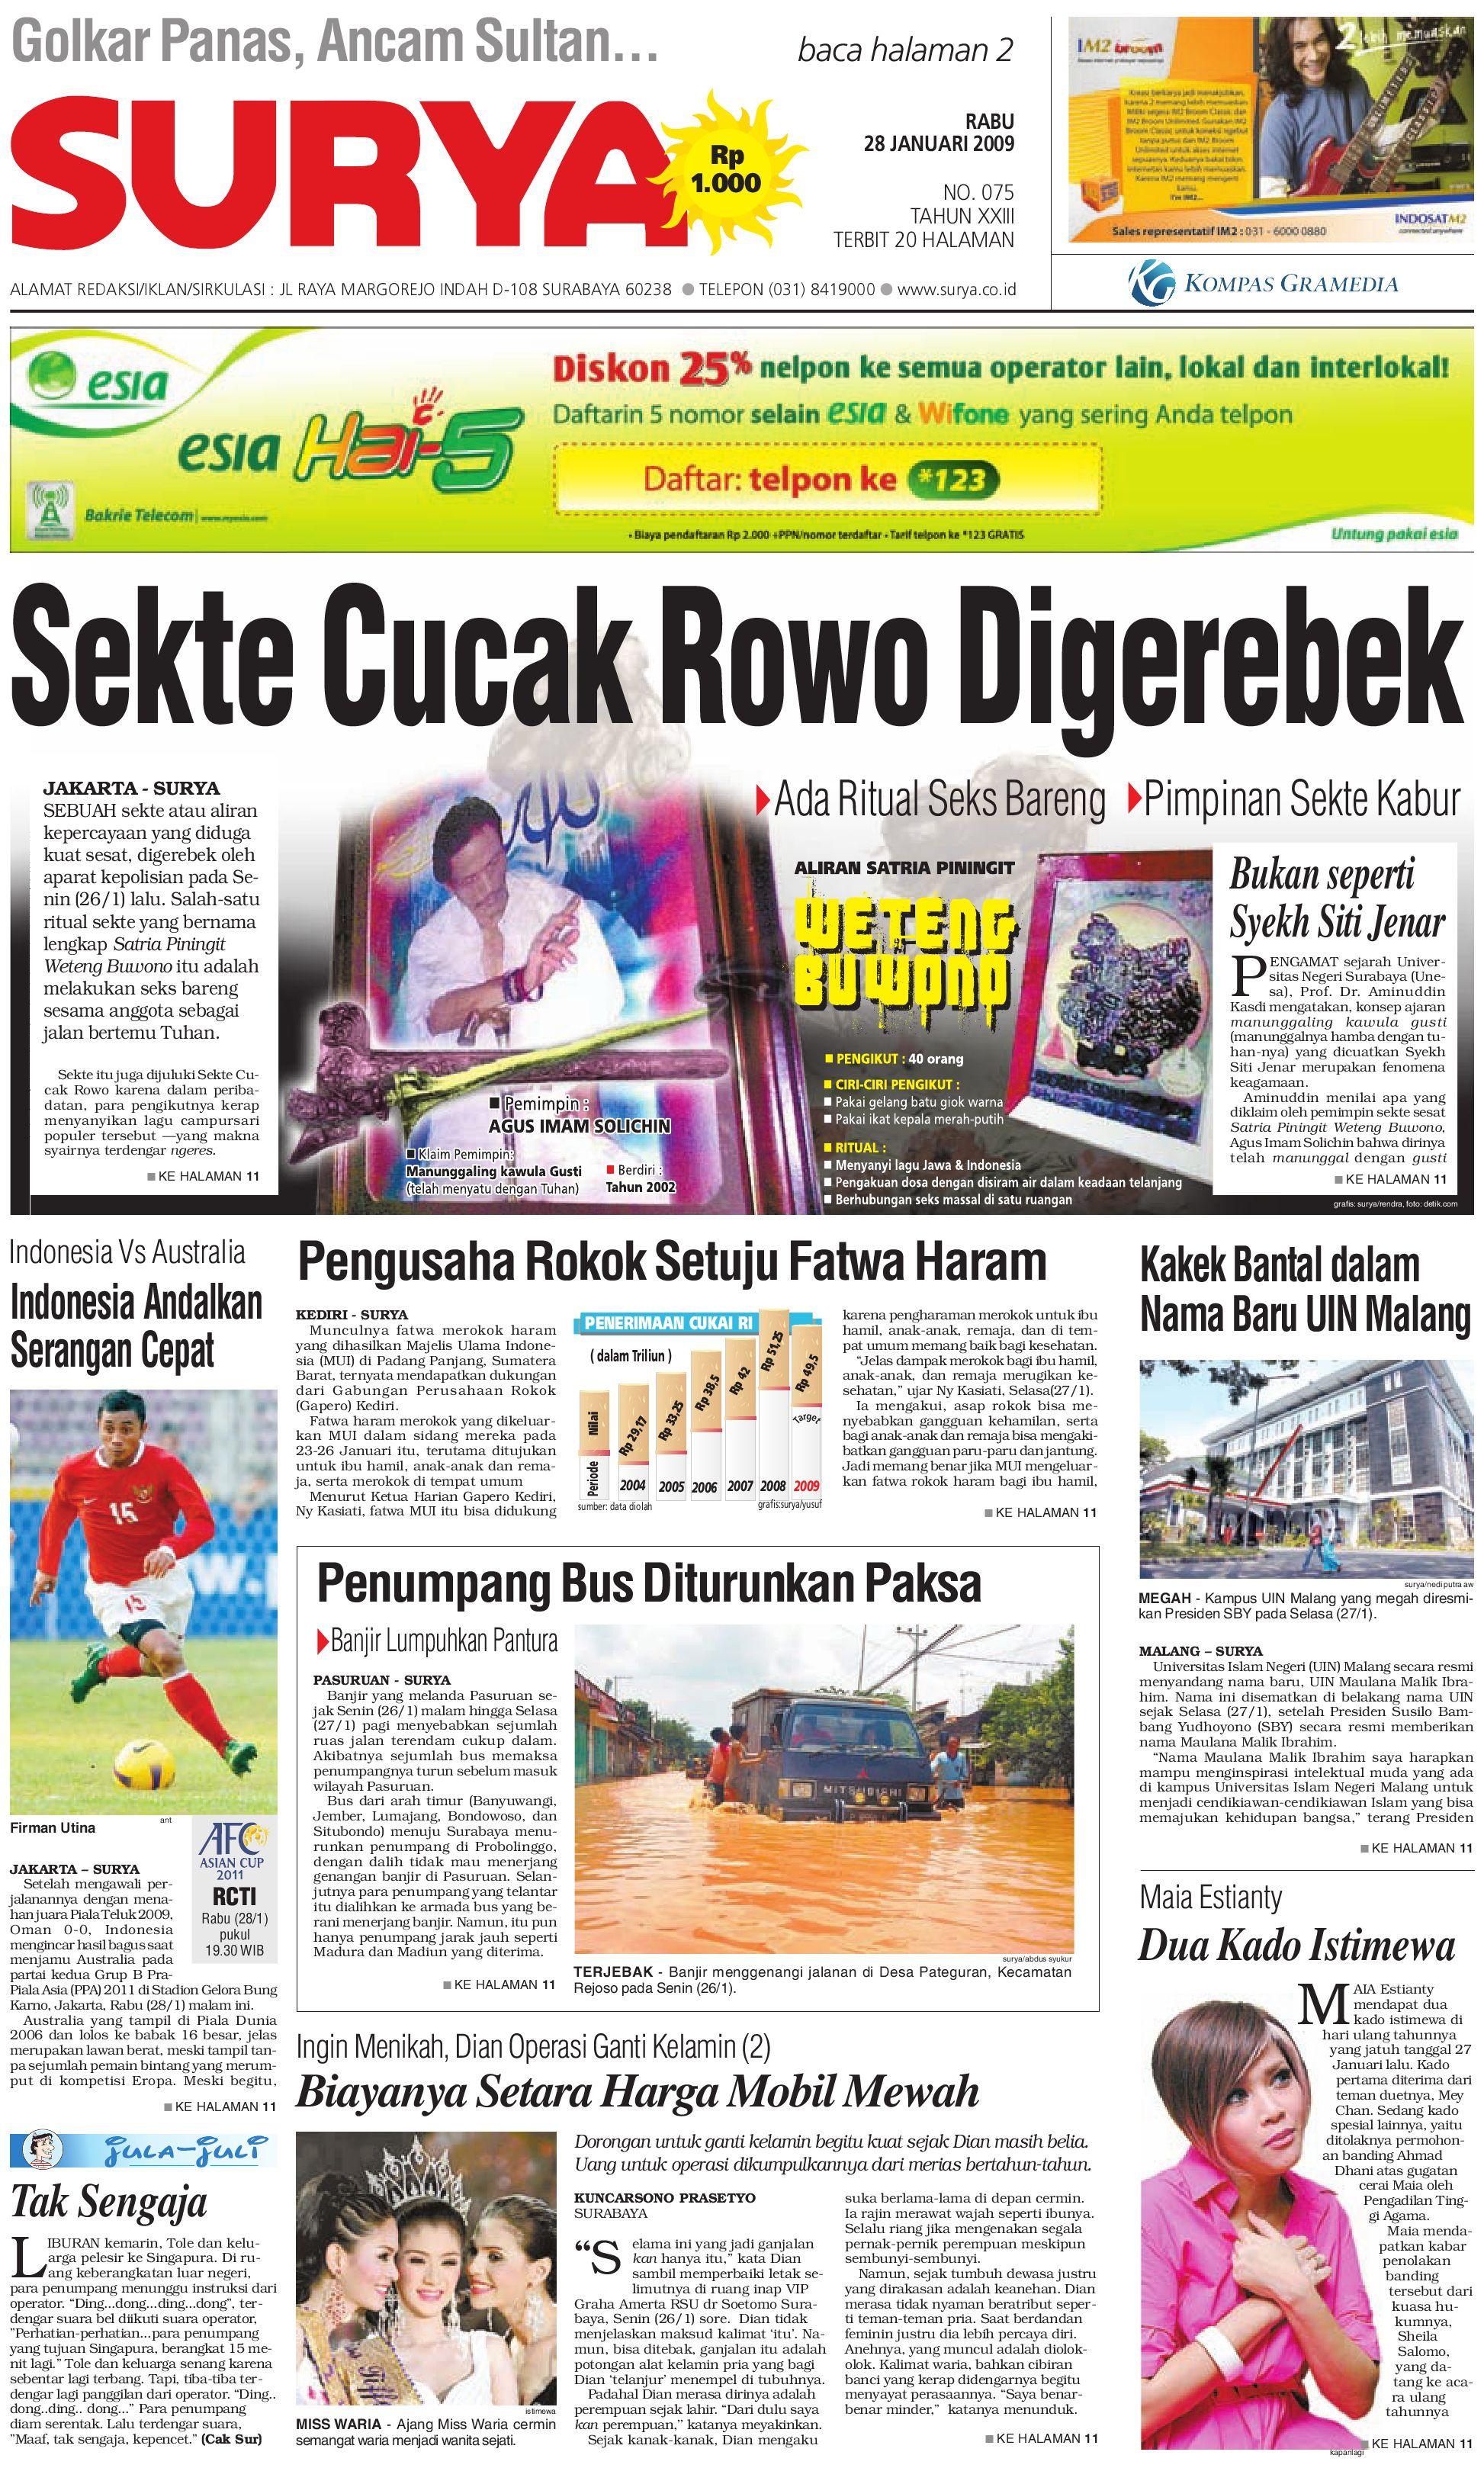 Surya Edisi Cetak 28 Januari 2009 By Harian SURYA Issuu